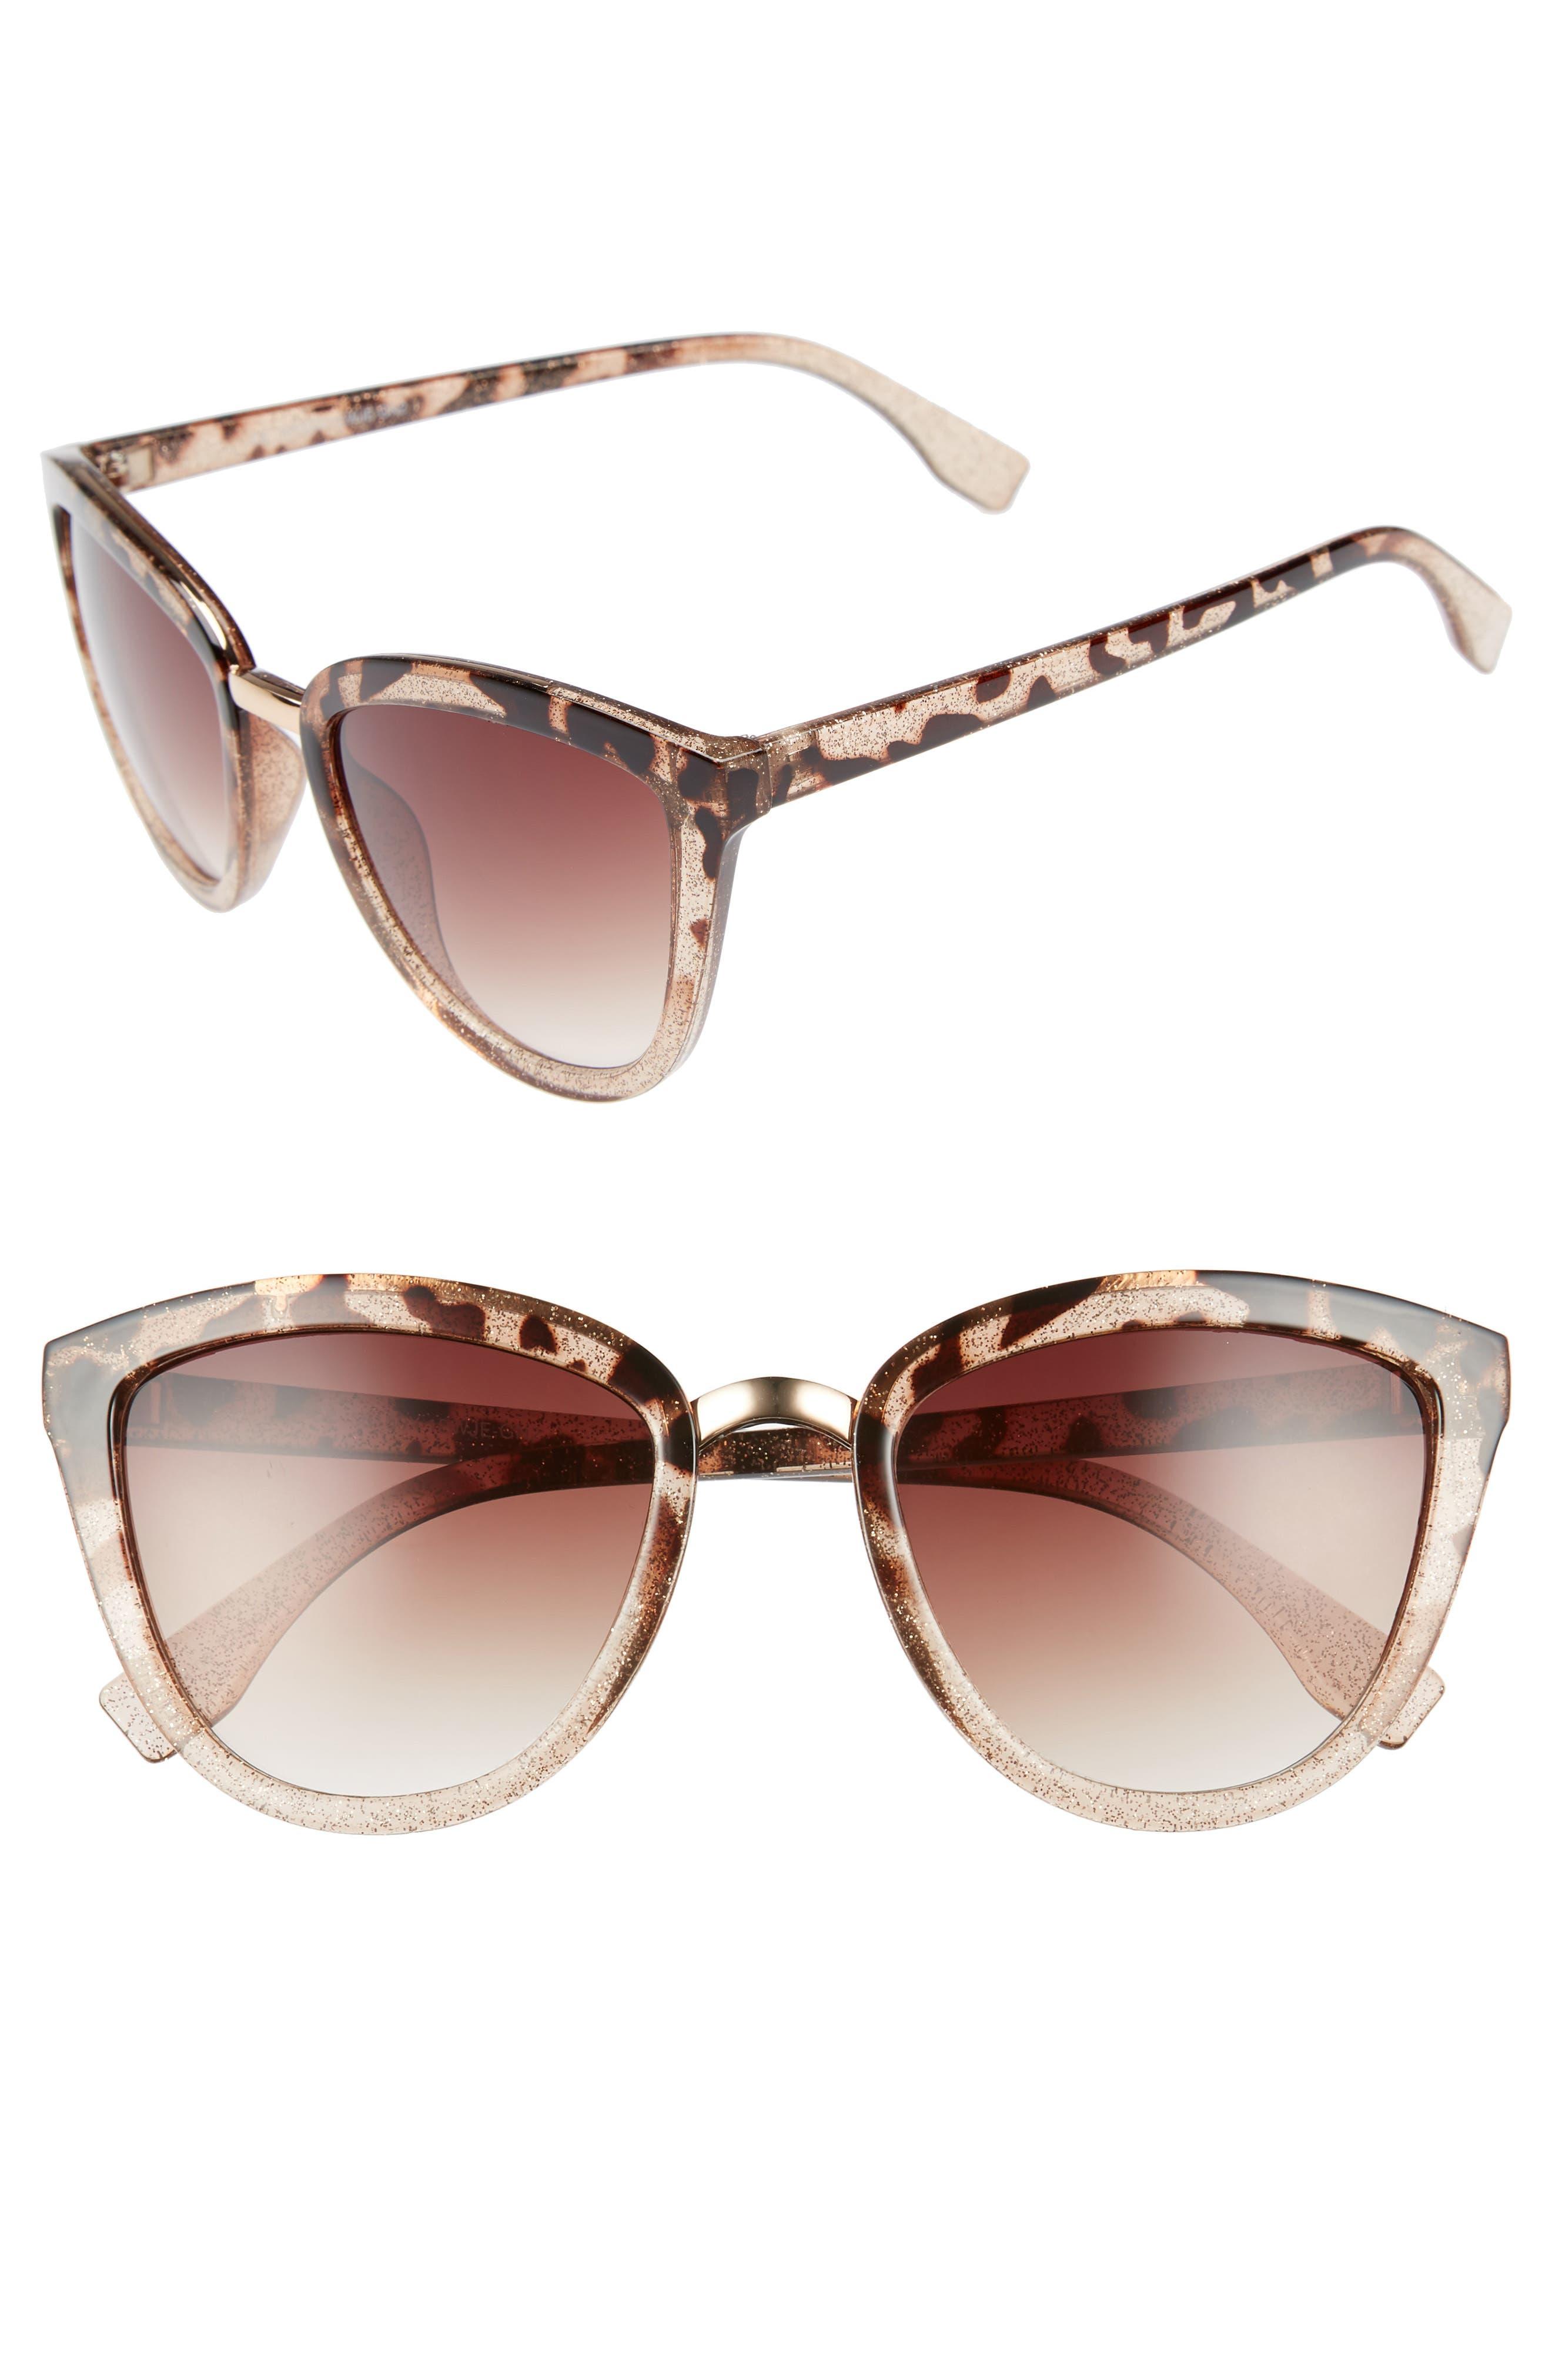 54mm Sparkle Cat Eye Sunglasses,                             Main thumbnail 1, color,                             Tort